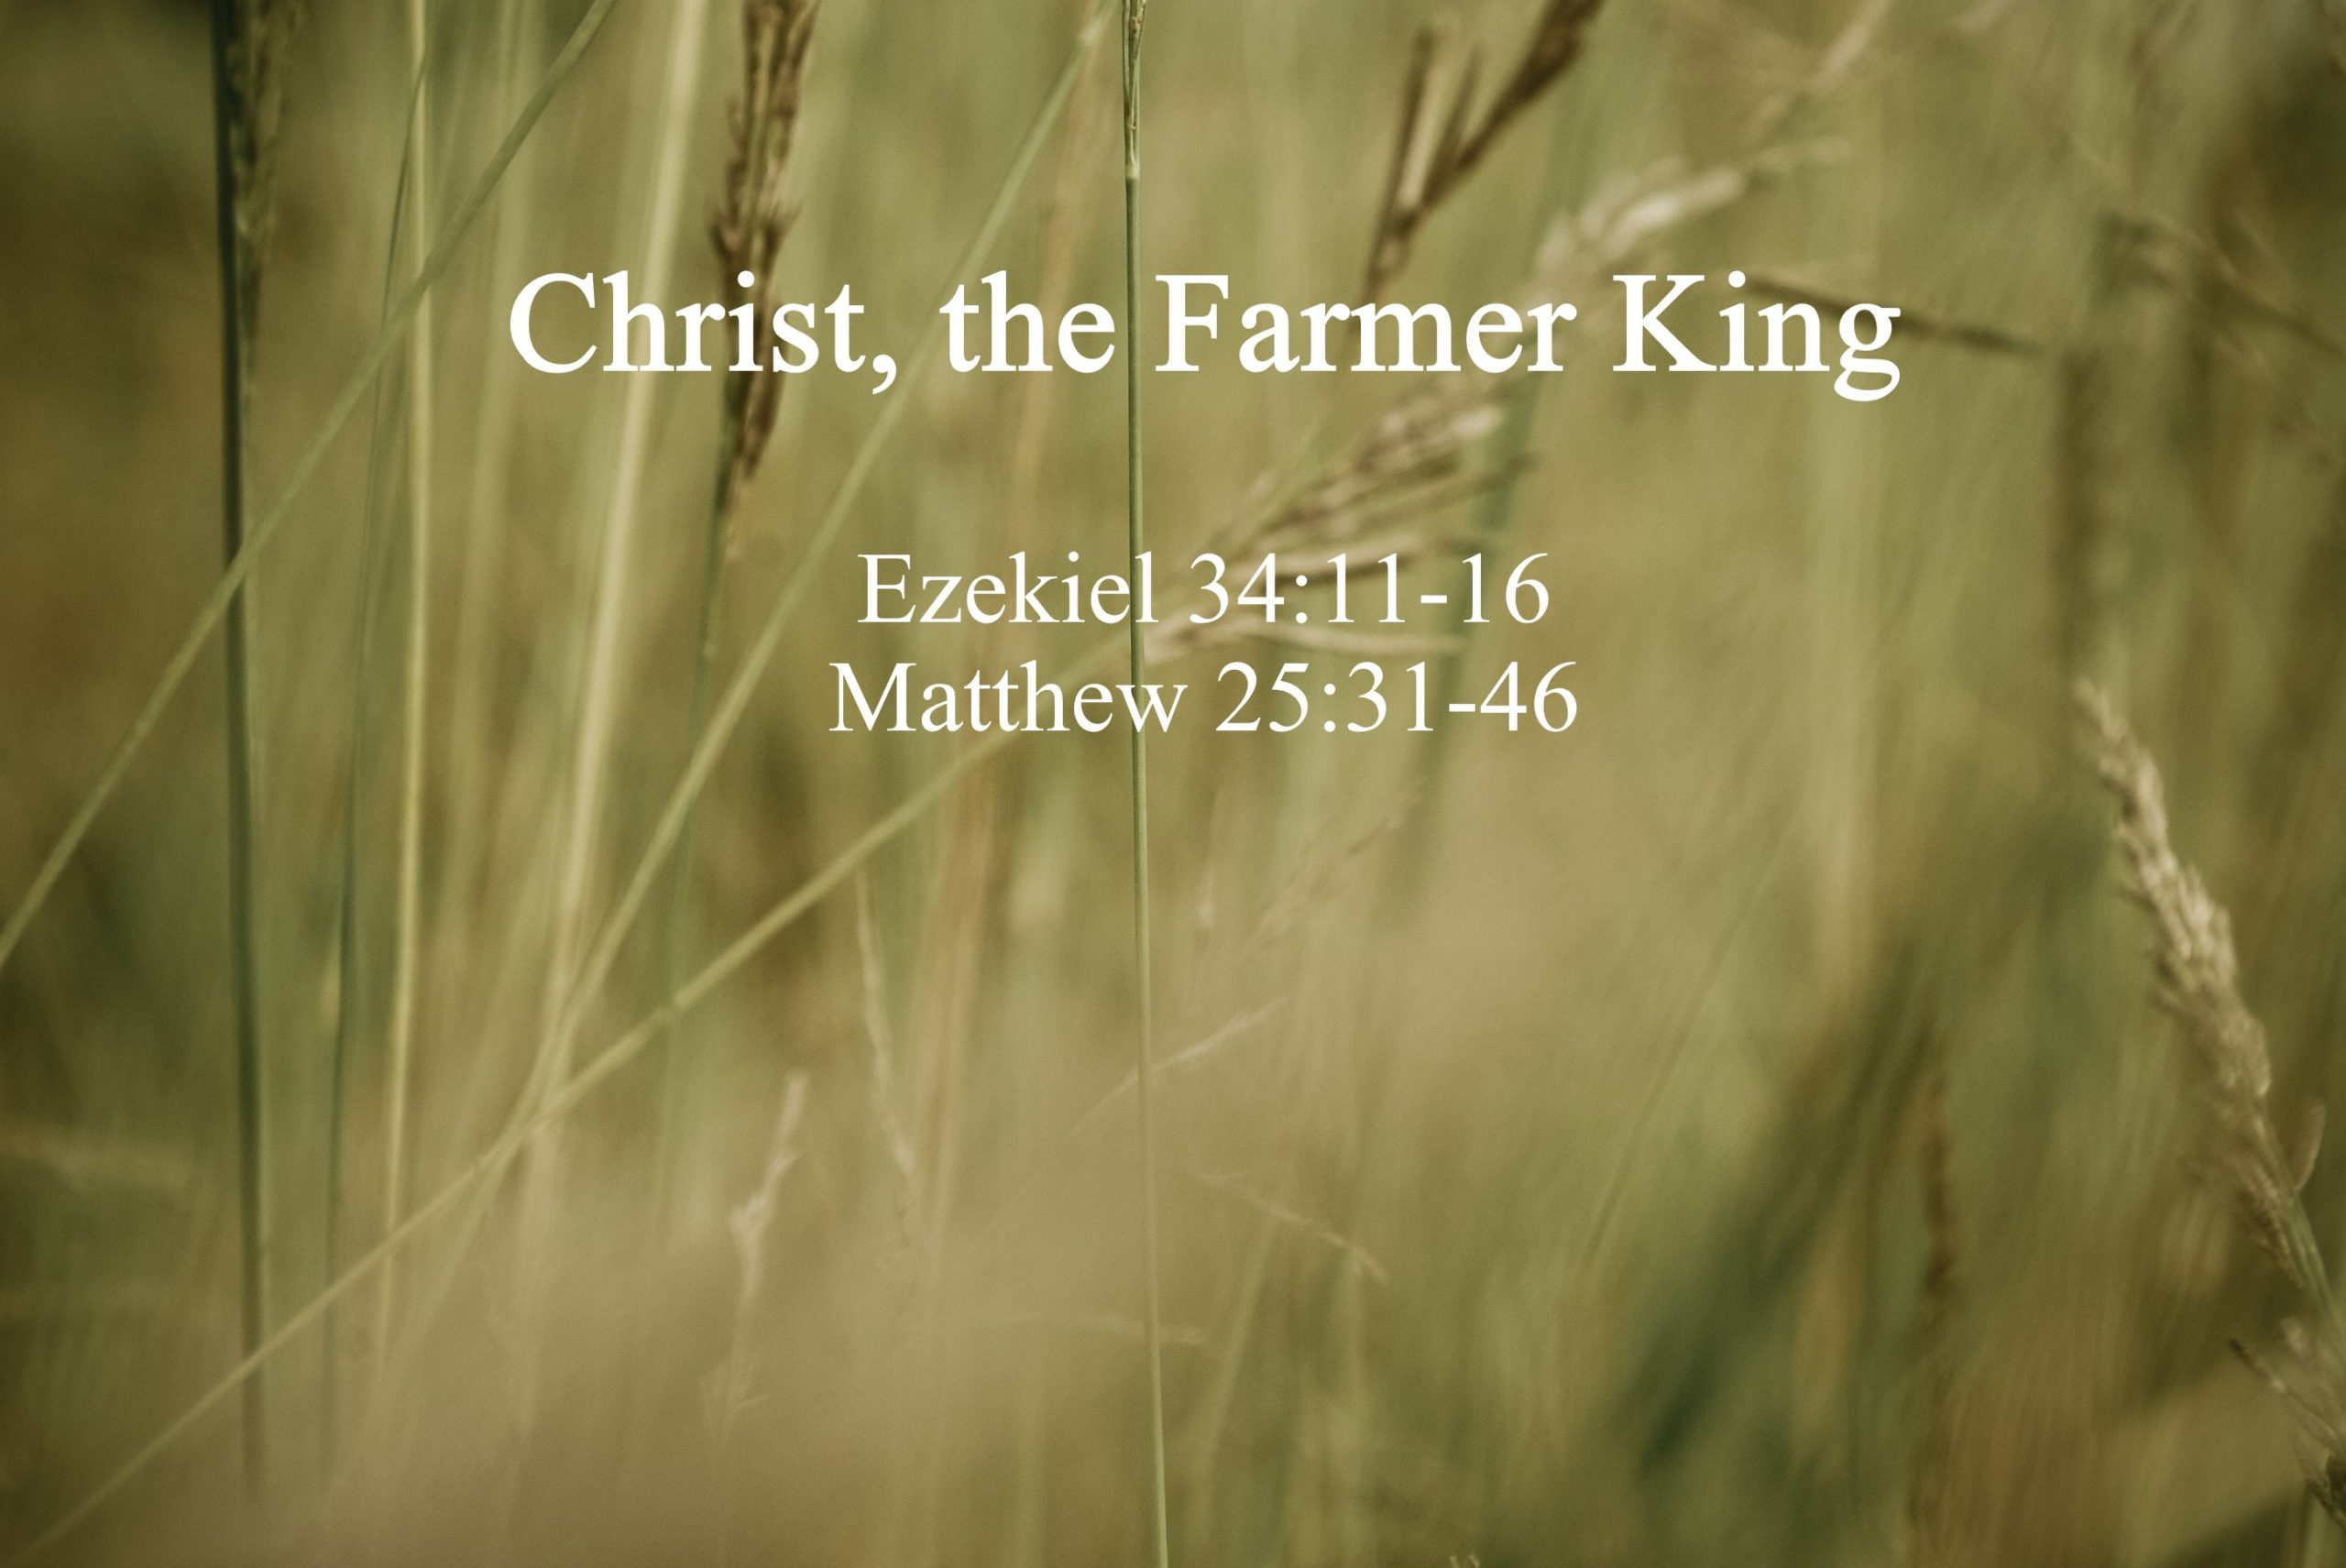 Christ, the Farmer King